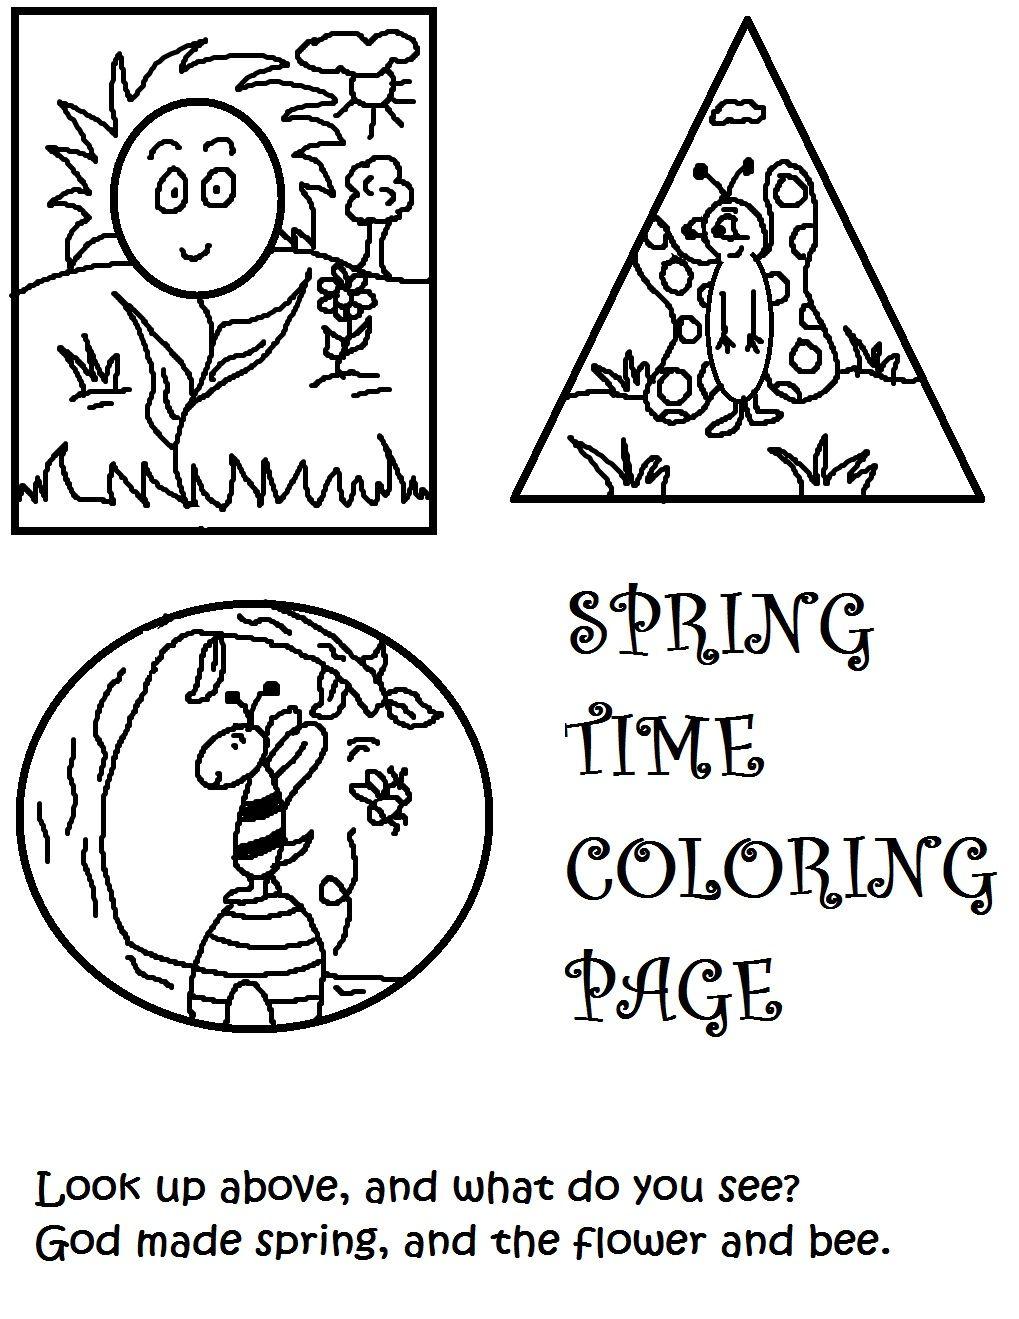 springtime coloring page | Church School/ Sunday School | Pinterest ...